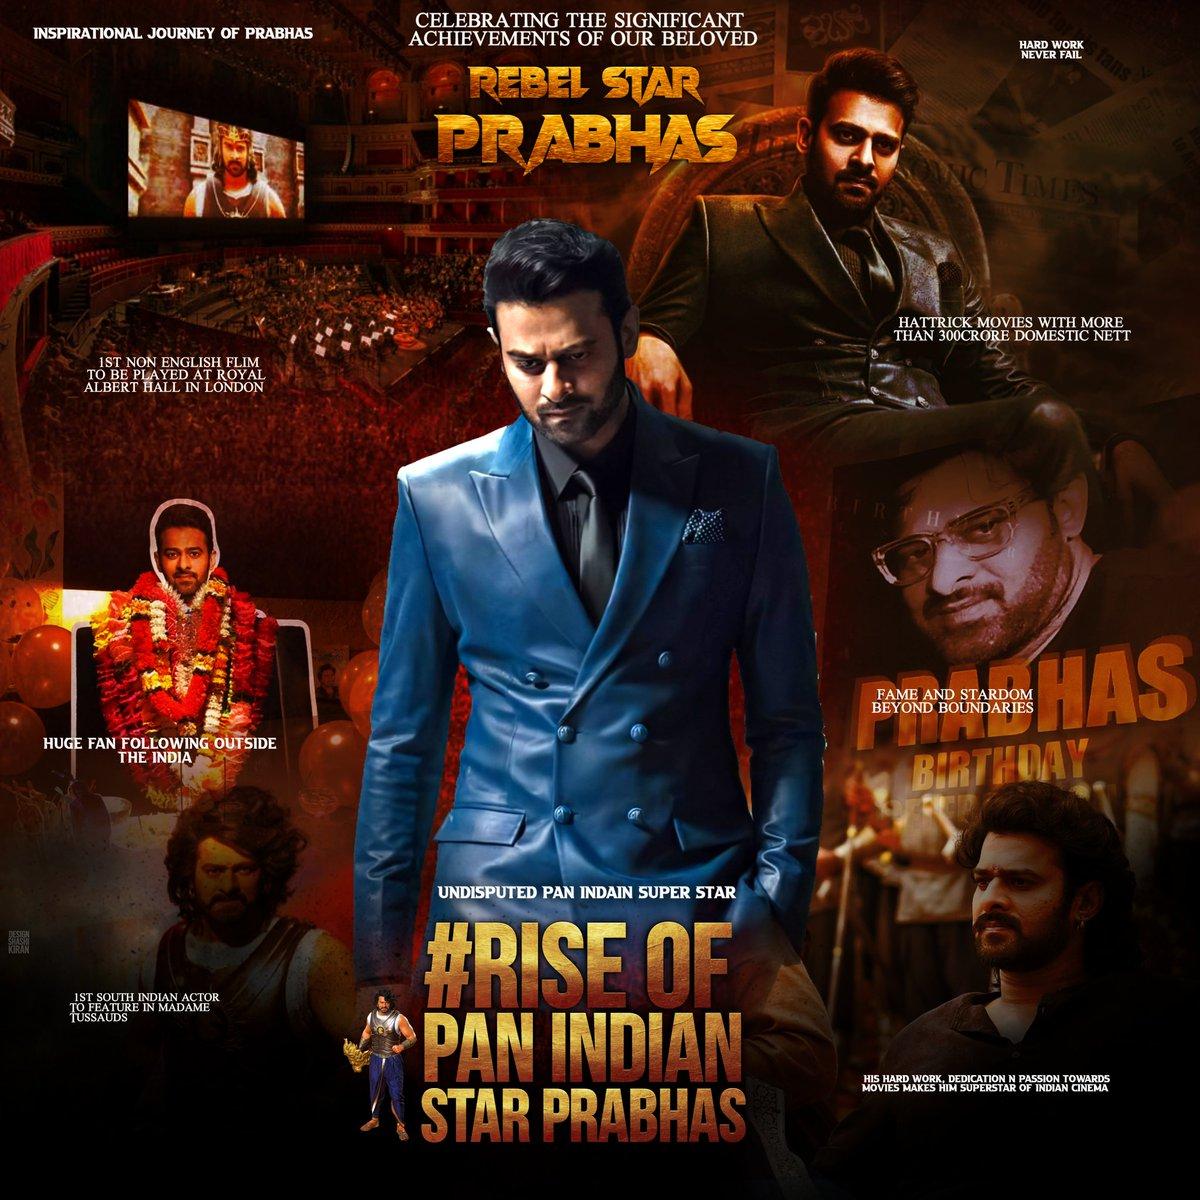 proudest fans of any indian actor  #RiseOfPanIndiaStarPrabhas pic.twitter.com/FN2kccpNuX